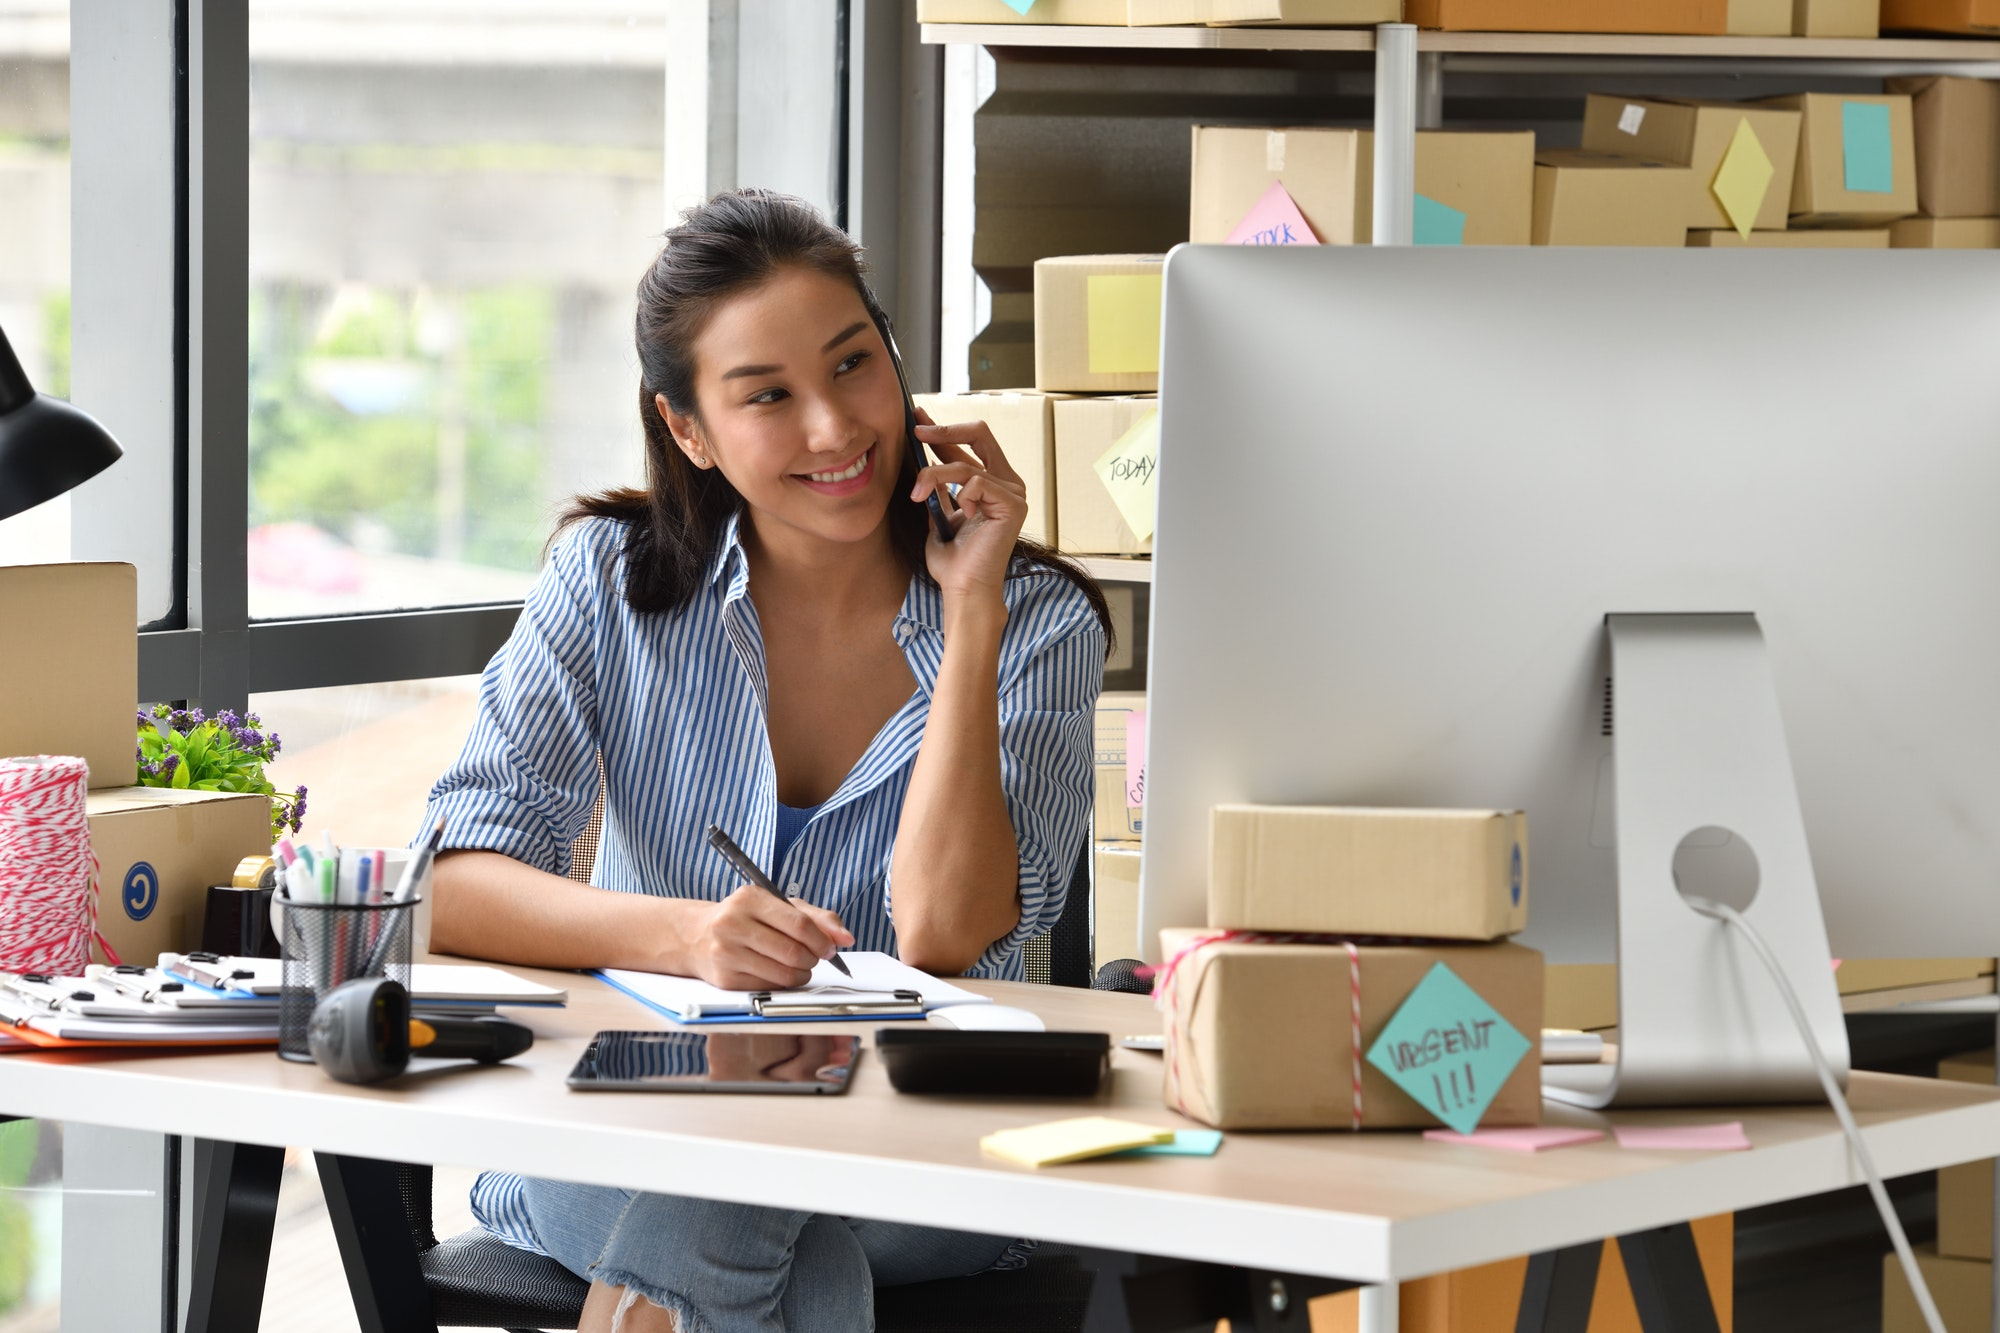 Business woman, Entrepreneur